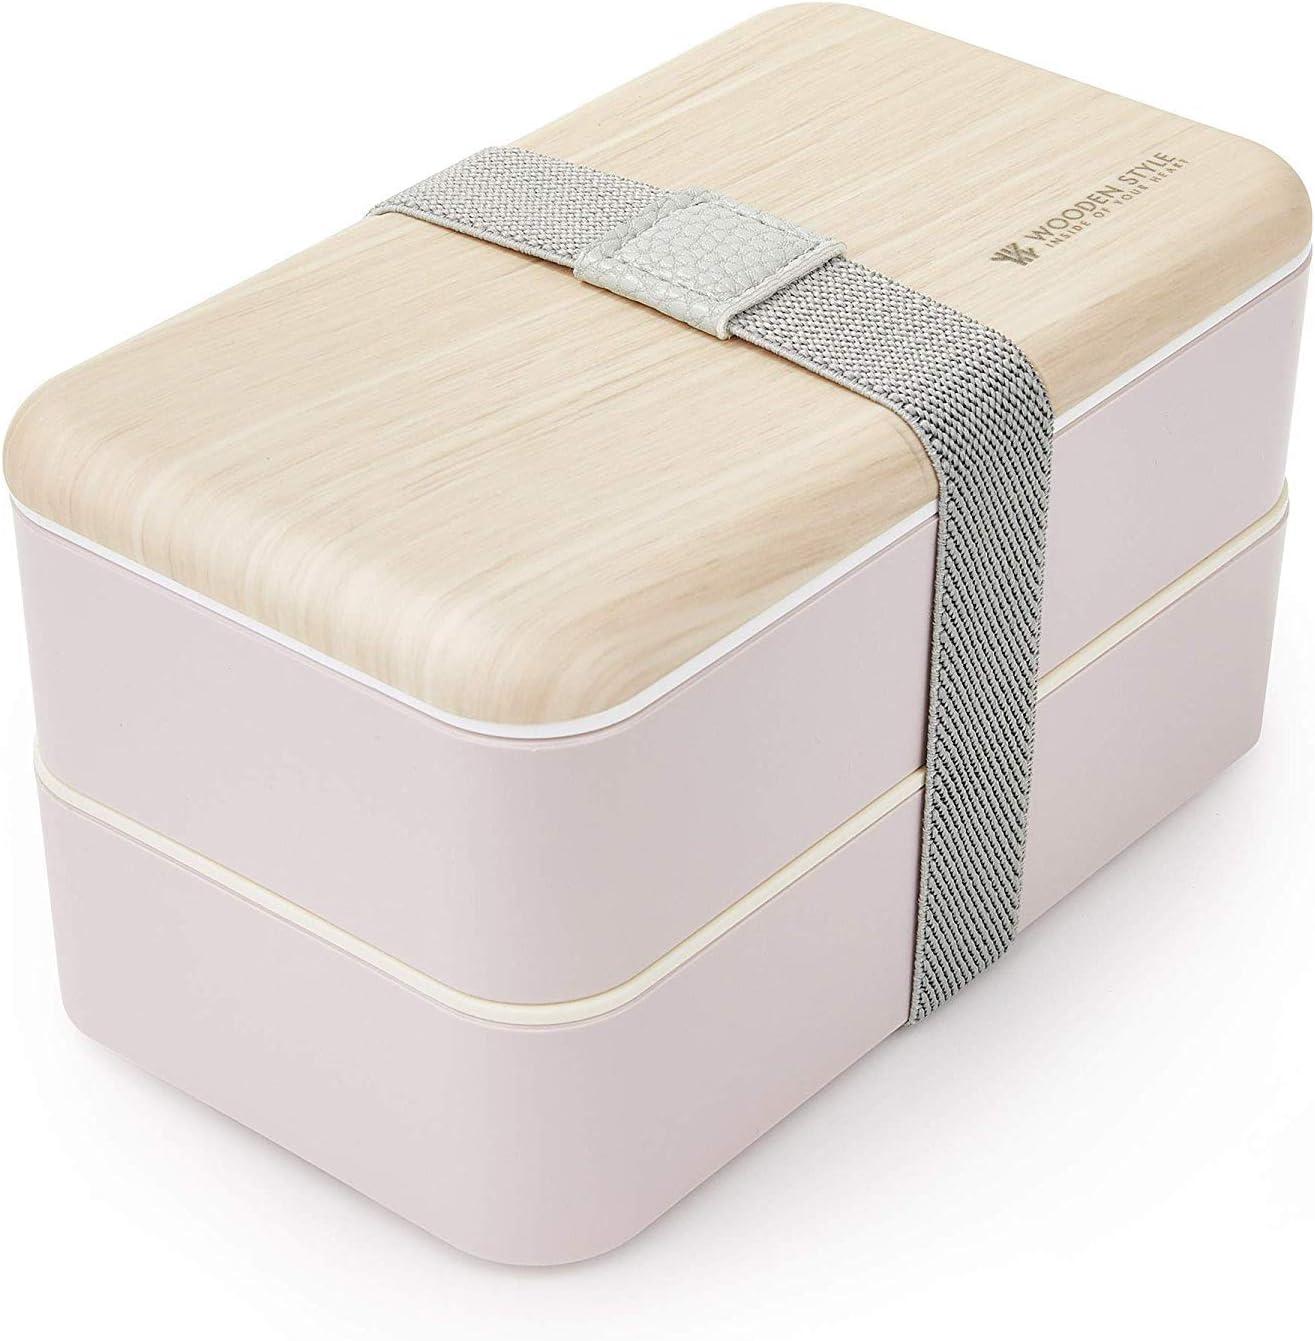 Bento Box Adultos o Ni/ños Bento Box 2 Compartimentos Estancos 1200 ml Thousanday Fiambrera Bento Bamb/ú Blanco Microondas y Lavavajillas Tupper Design con 2 Cubiertos